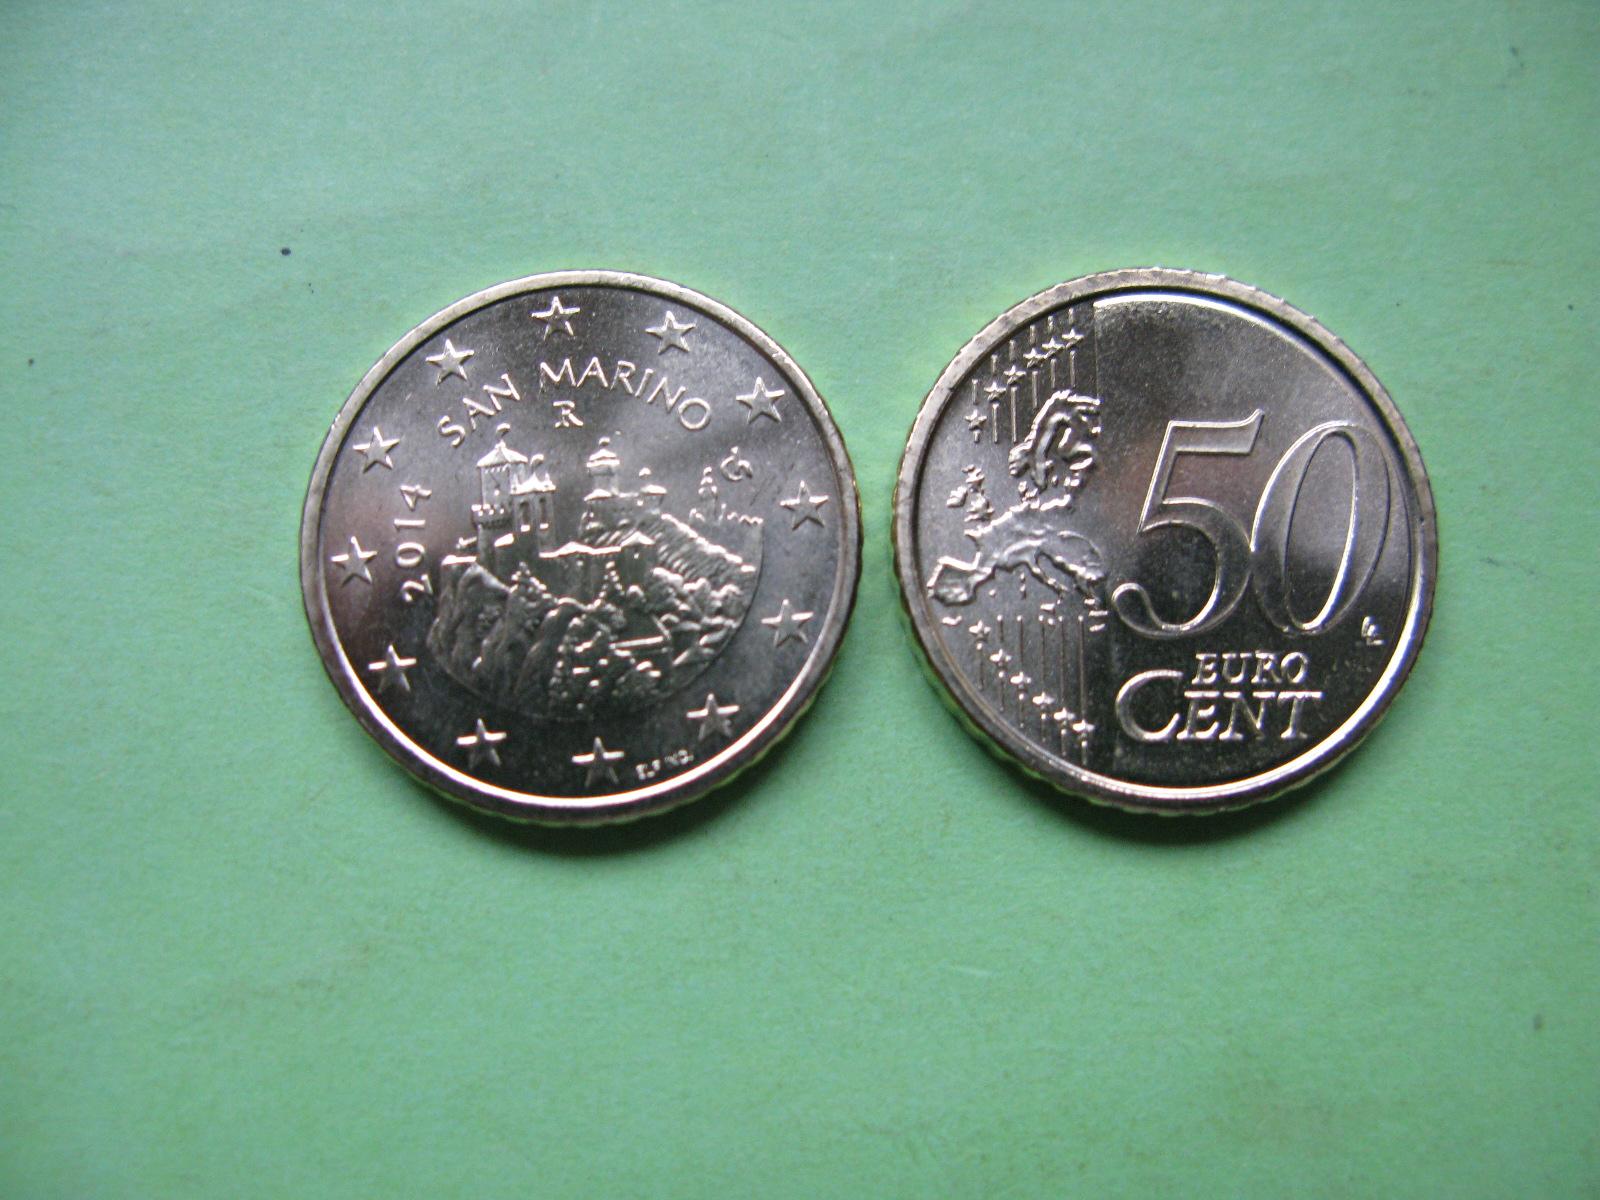 Сан Марино 50 евро центов 2014 г. UNC